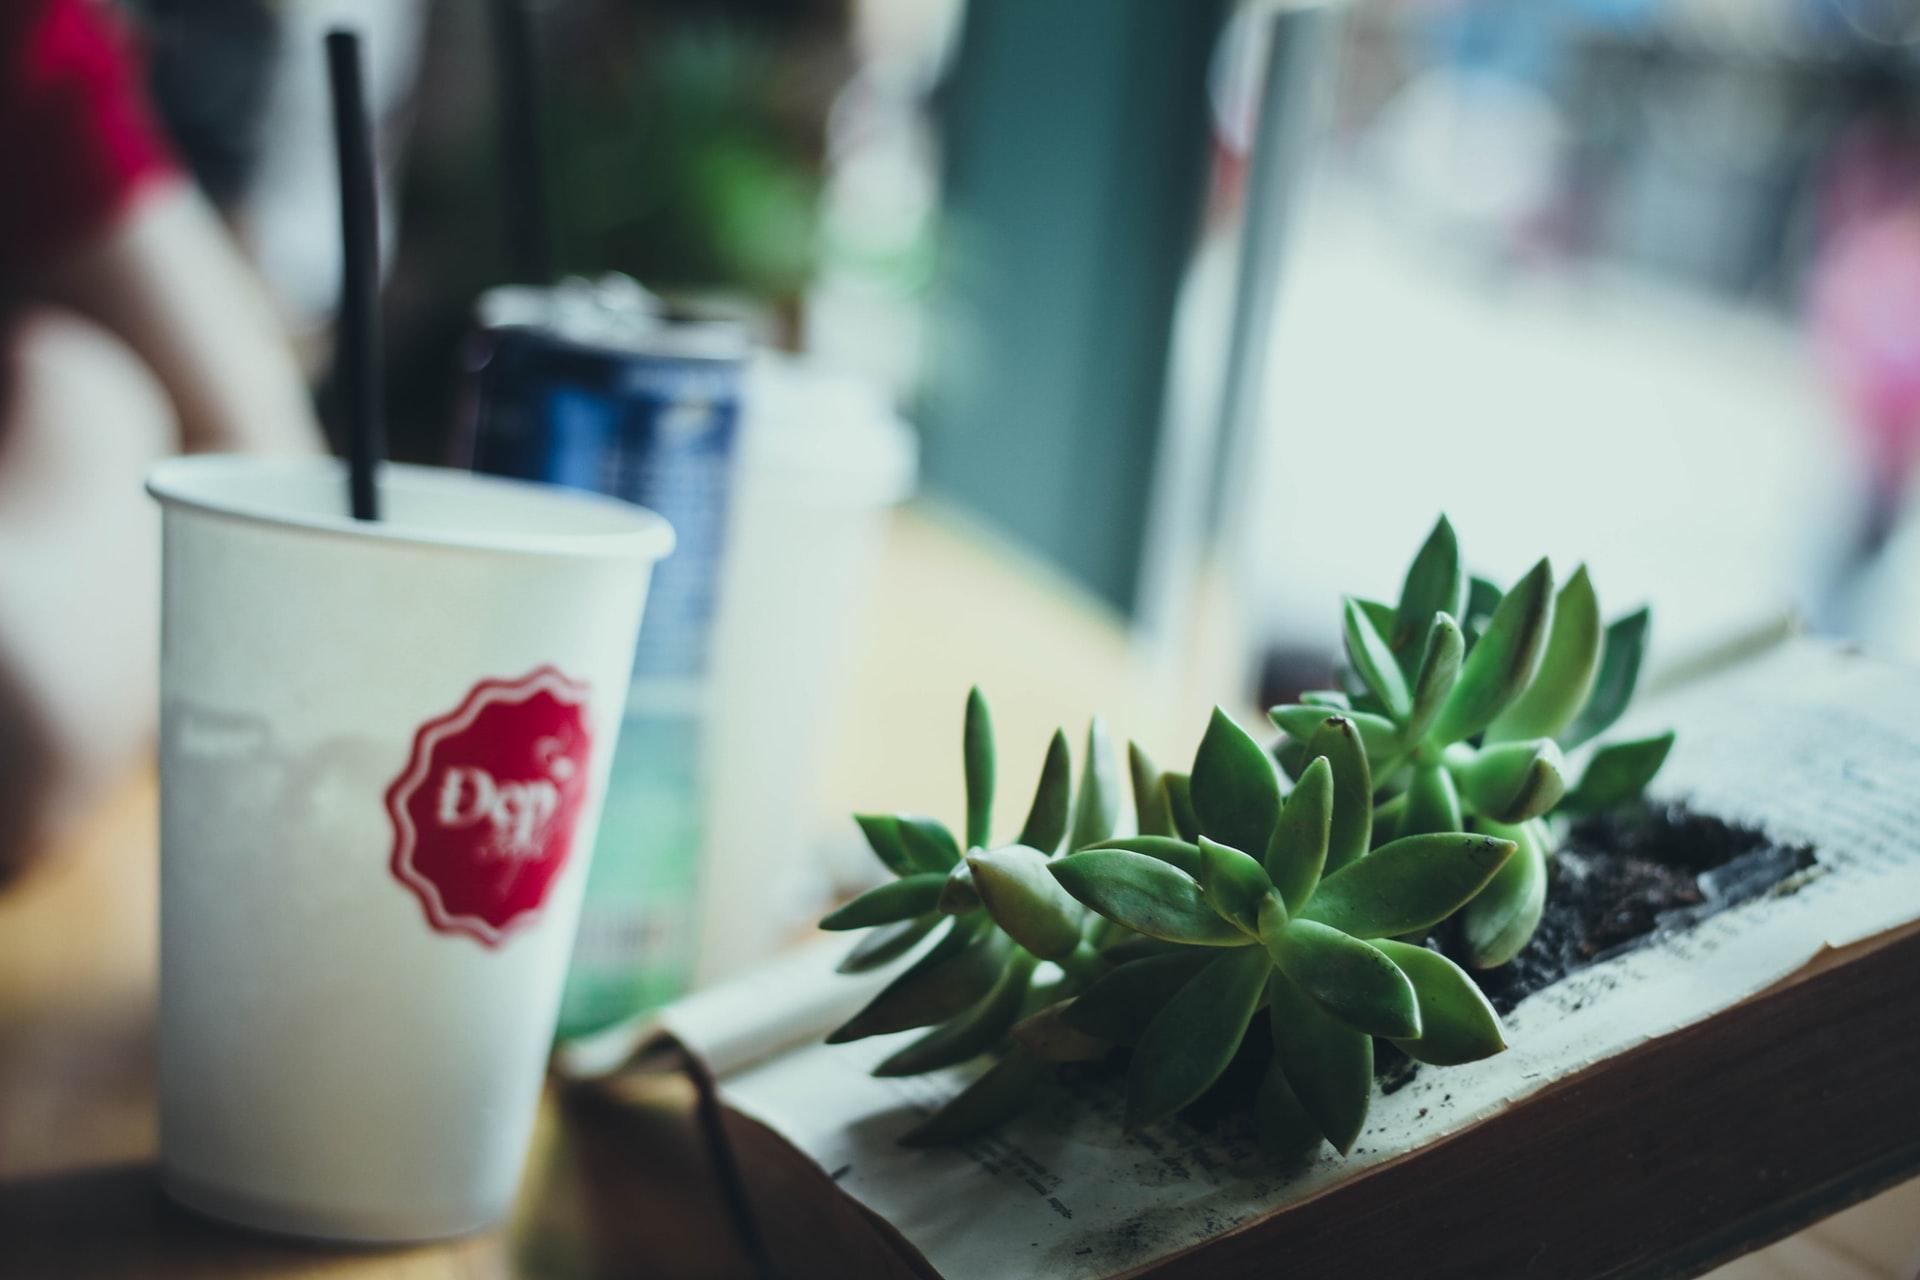 succulent-near-a-cup